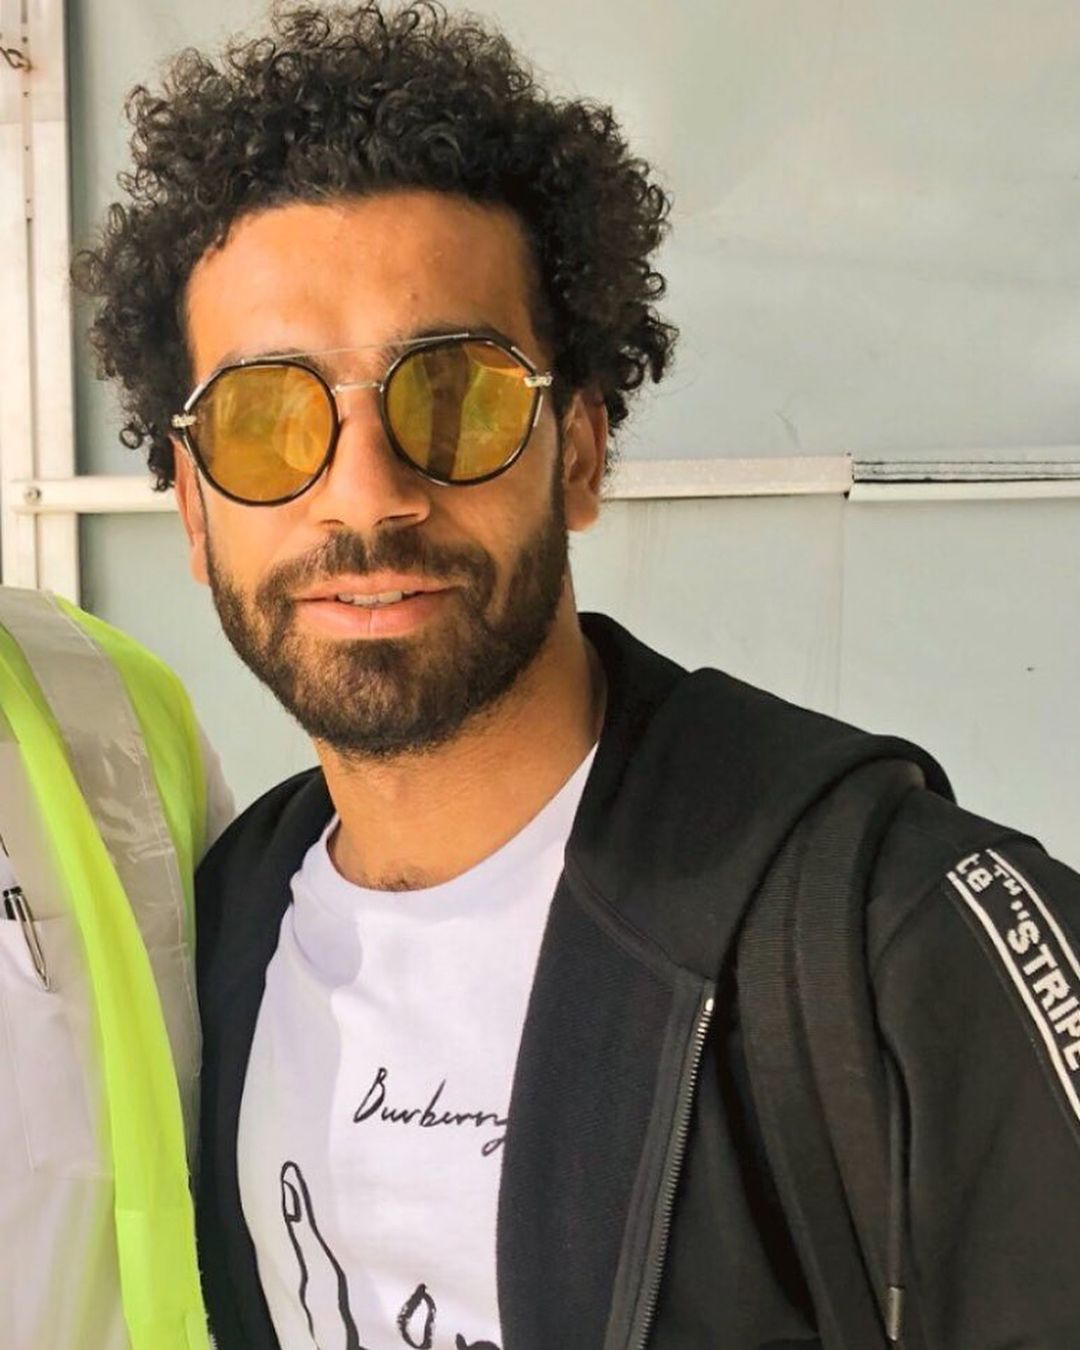 Mosalah محمد صلاح من مطار مالديف صباح اليوم Mosalahws الاخبار بتنزل في الستو Mohamed Salah Mo Salah Salah